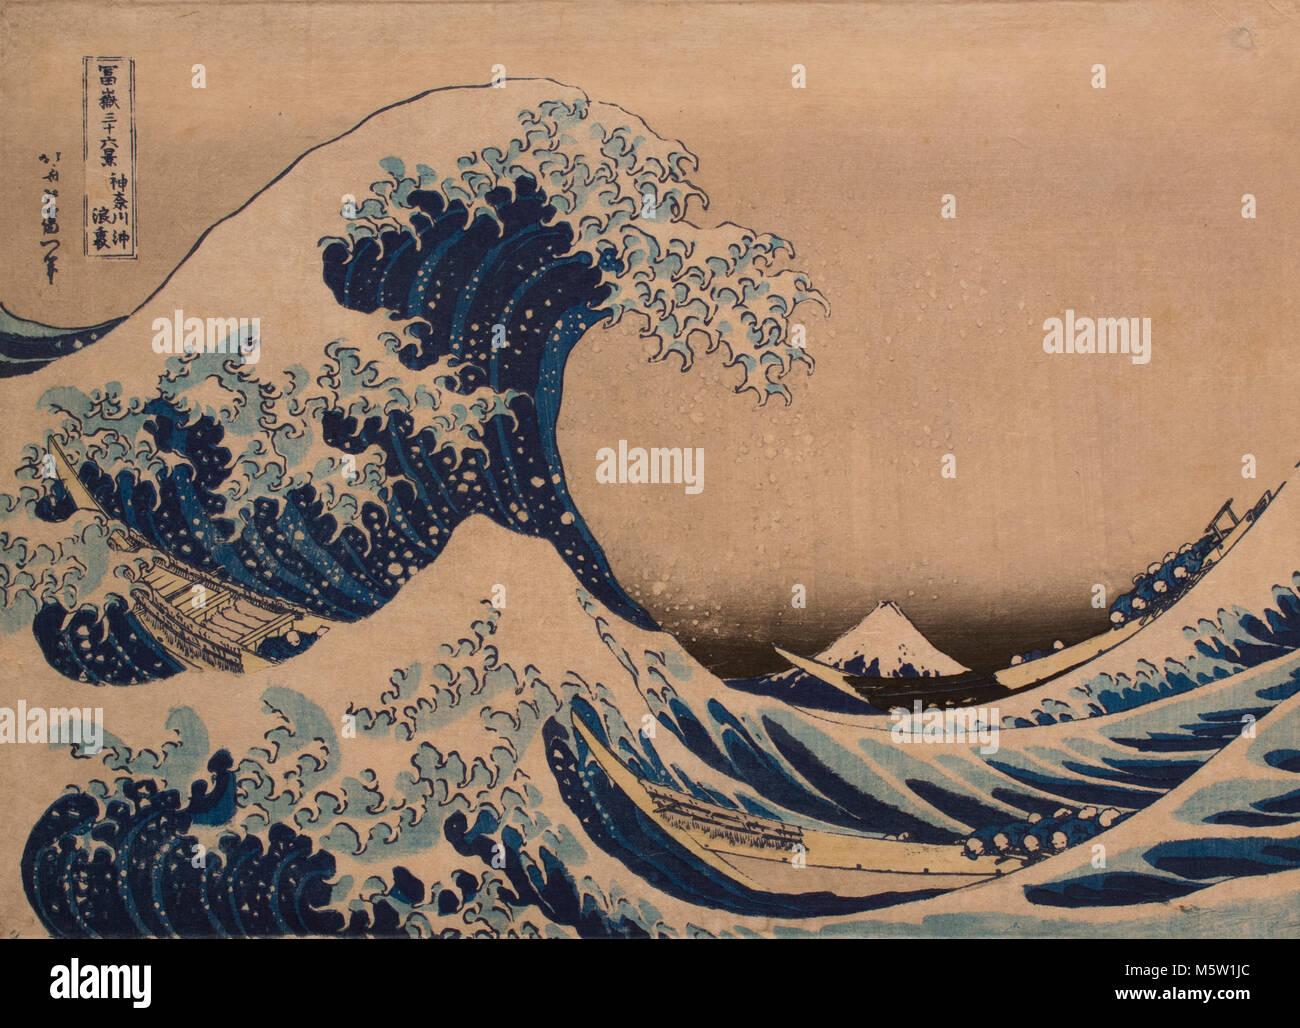 The Great Wave, Hokusai, British Museum, London - Stock Image